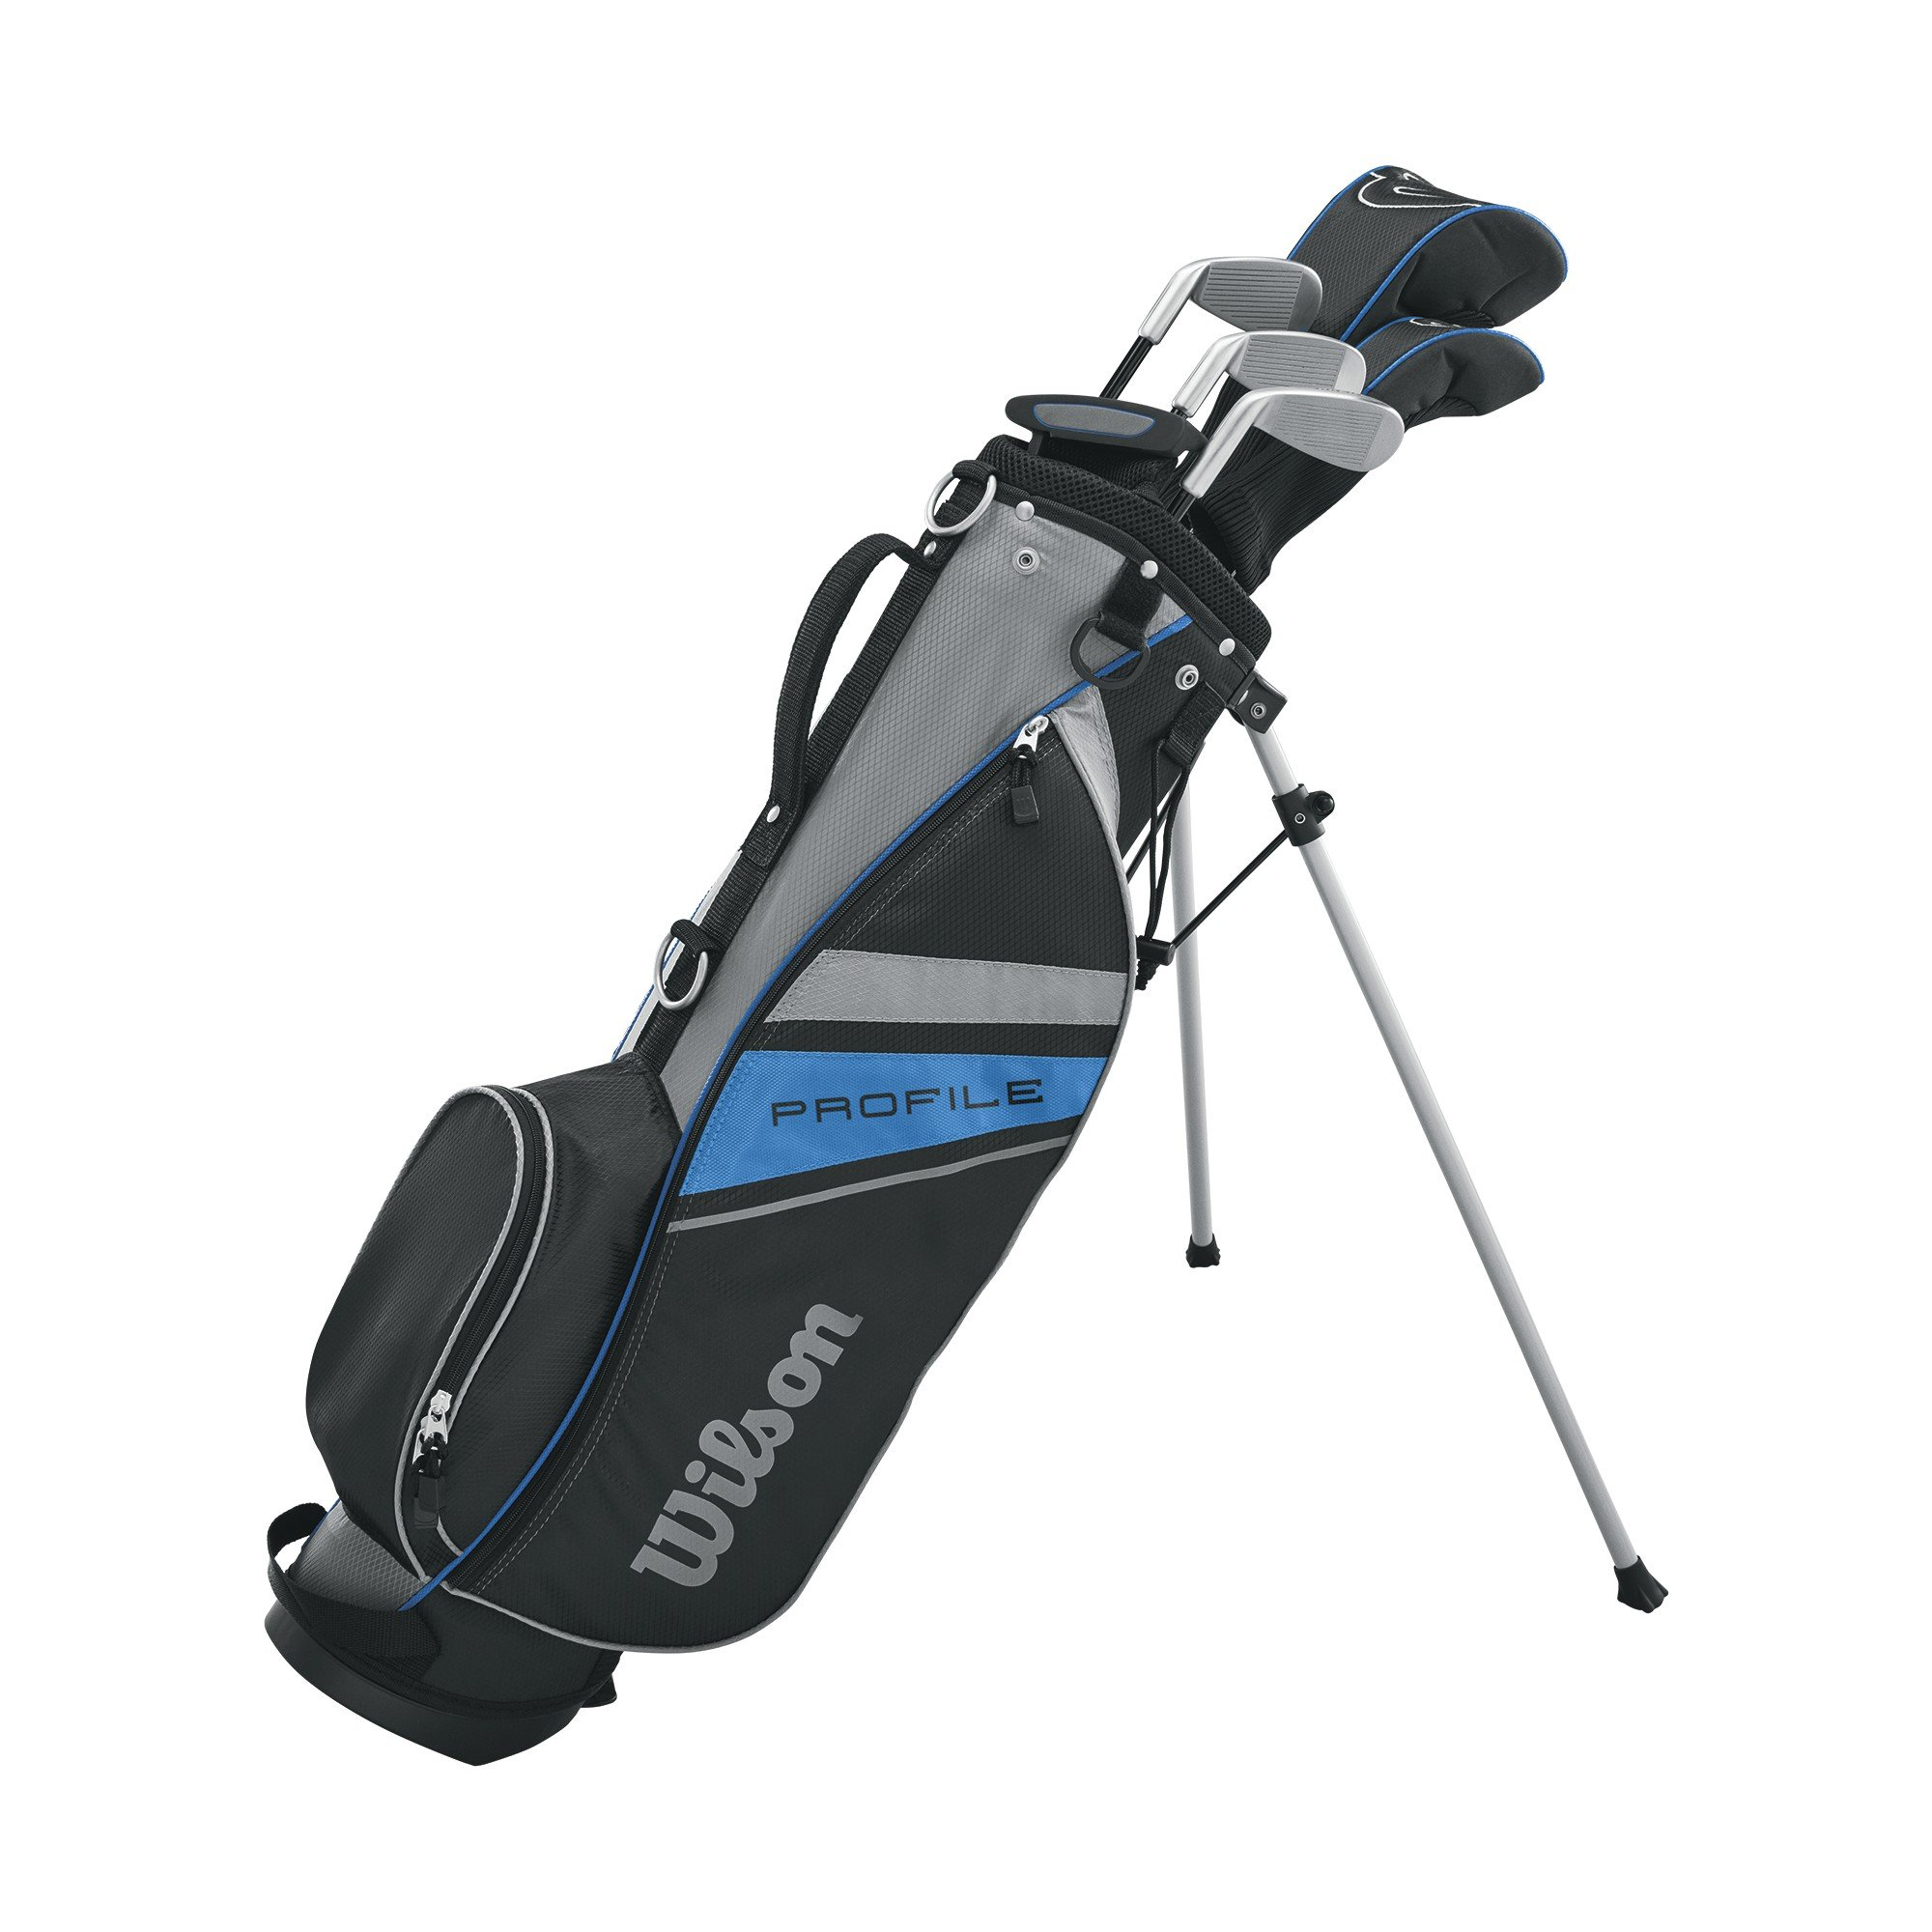 Wilson Unisex Profile Kid's Golf Set Large Left Hand, Blue (Ages 11-14) by Wilson (Image #7)